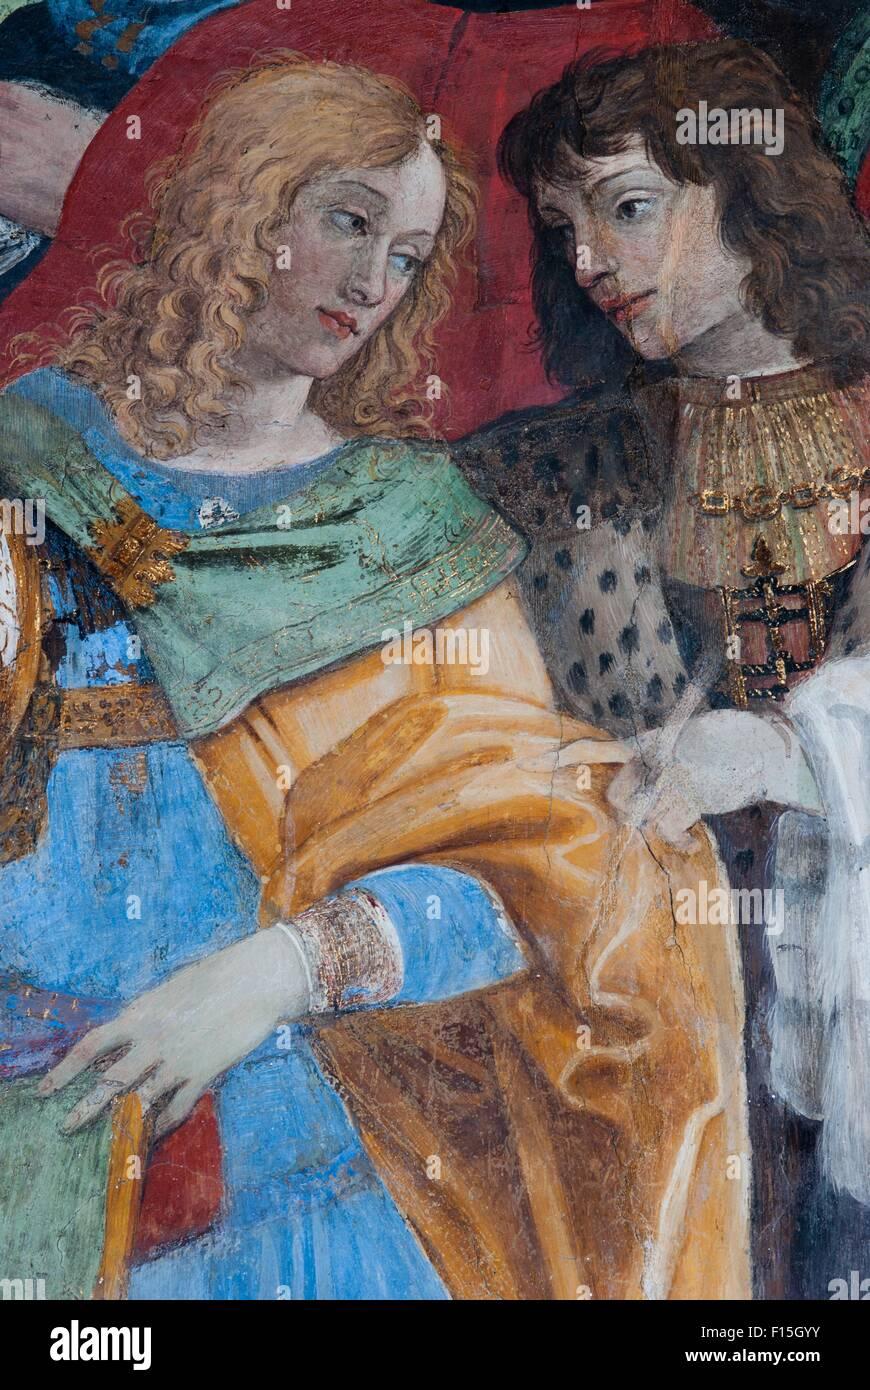 A detail of the fresco of Filippino Lippi in the Carafa Chapel in the church of Santa Maria sopra Minerva, Rome, Stock Photo